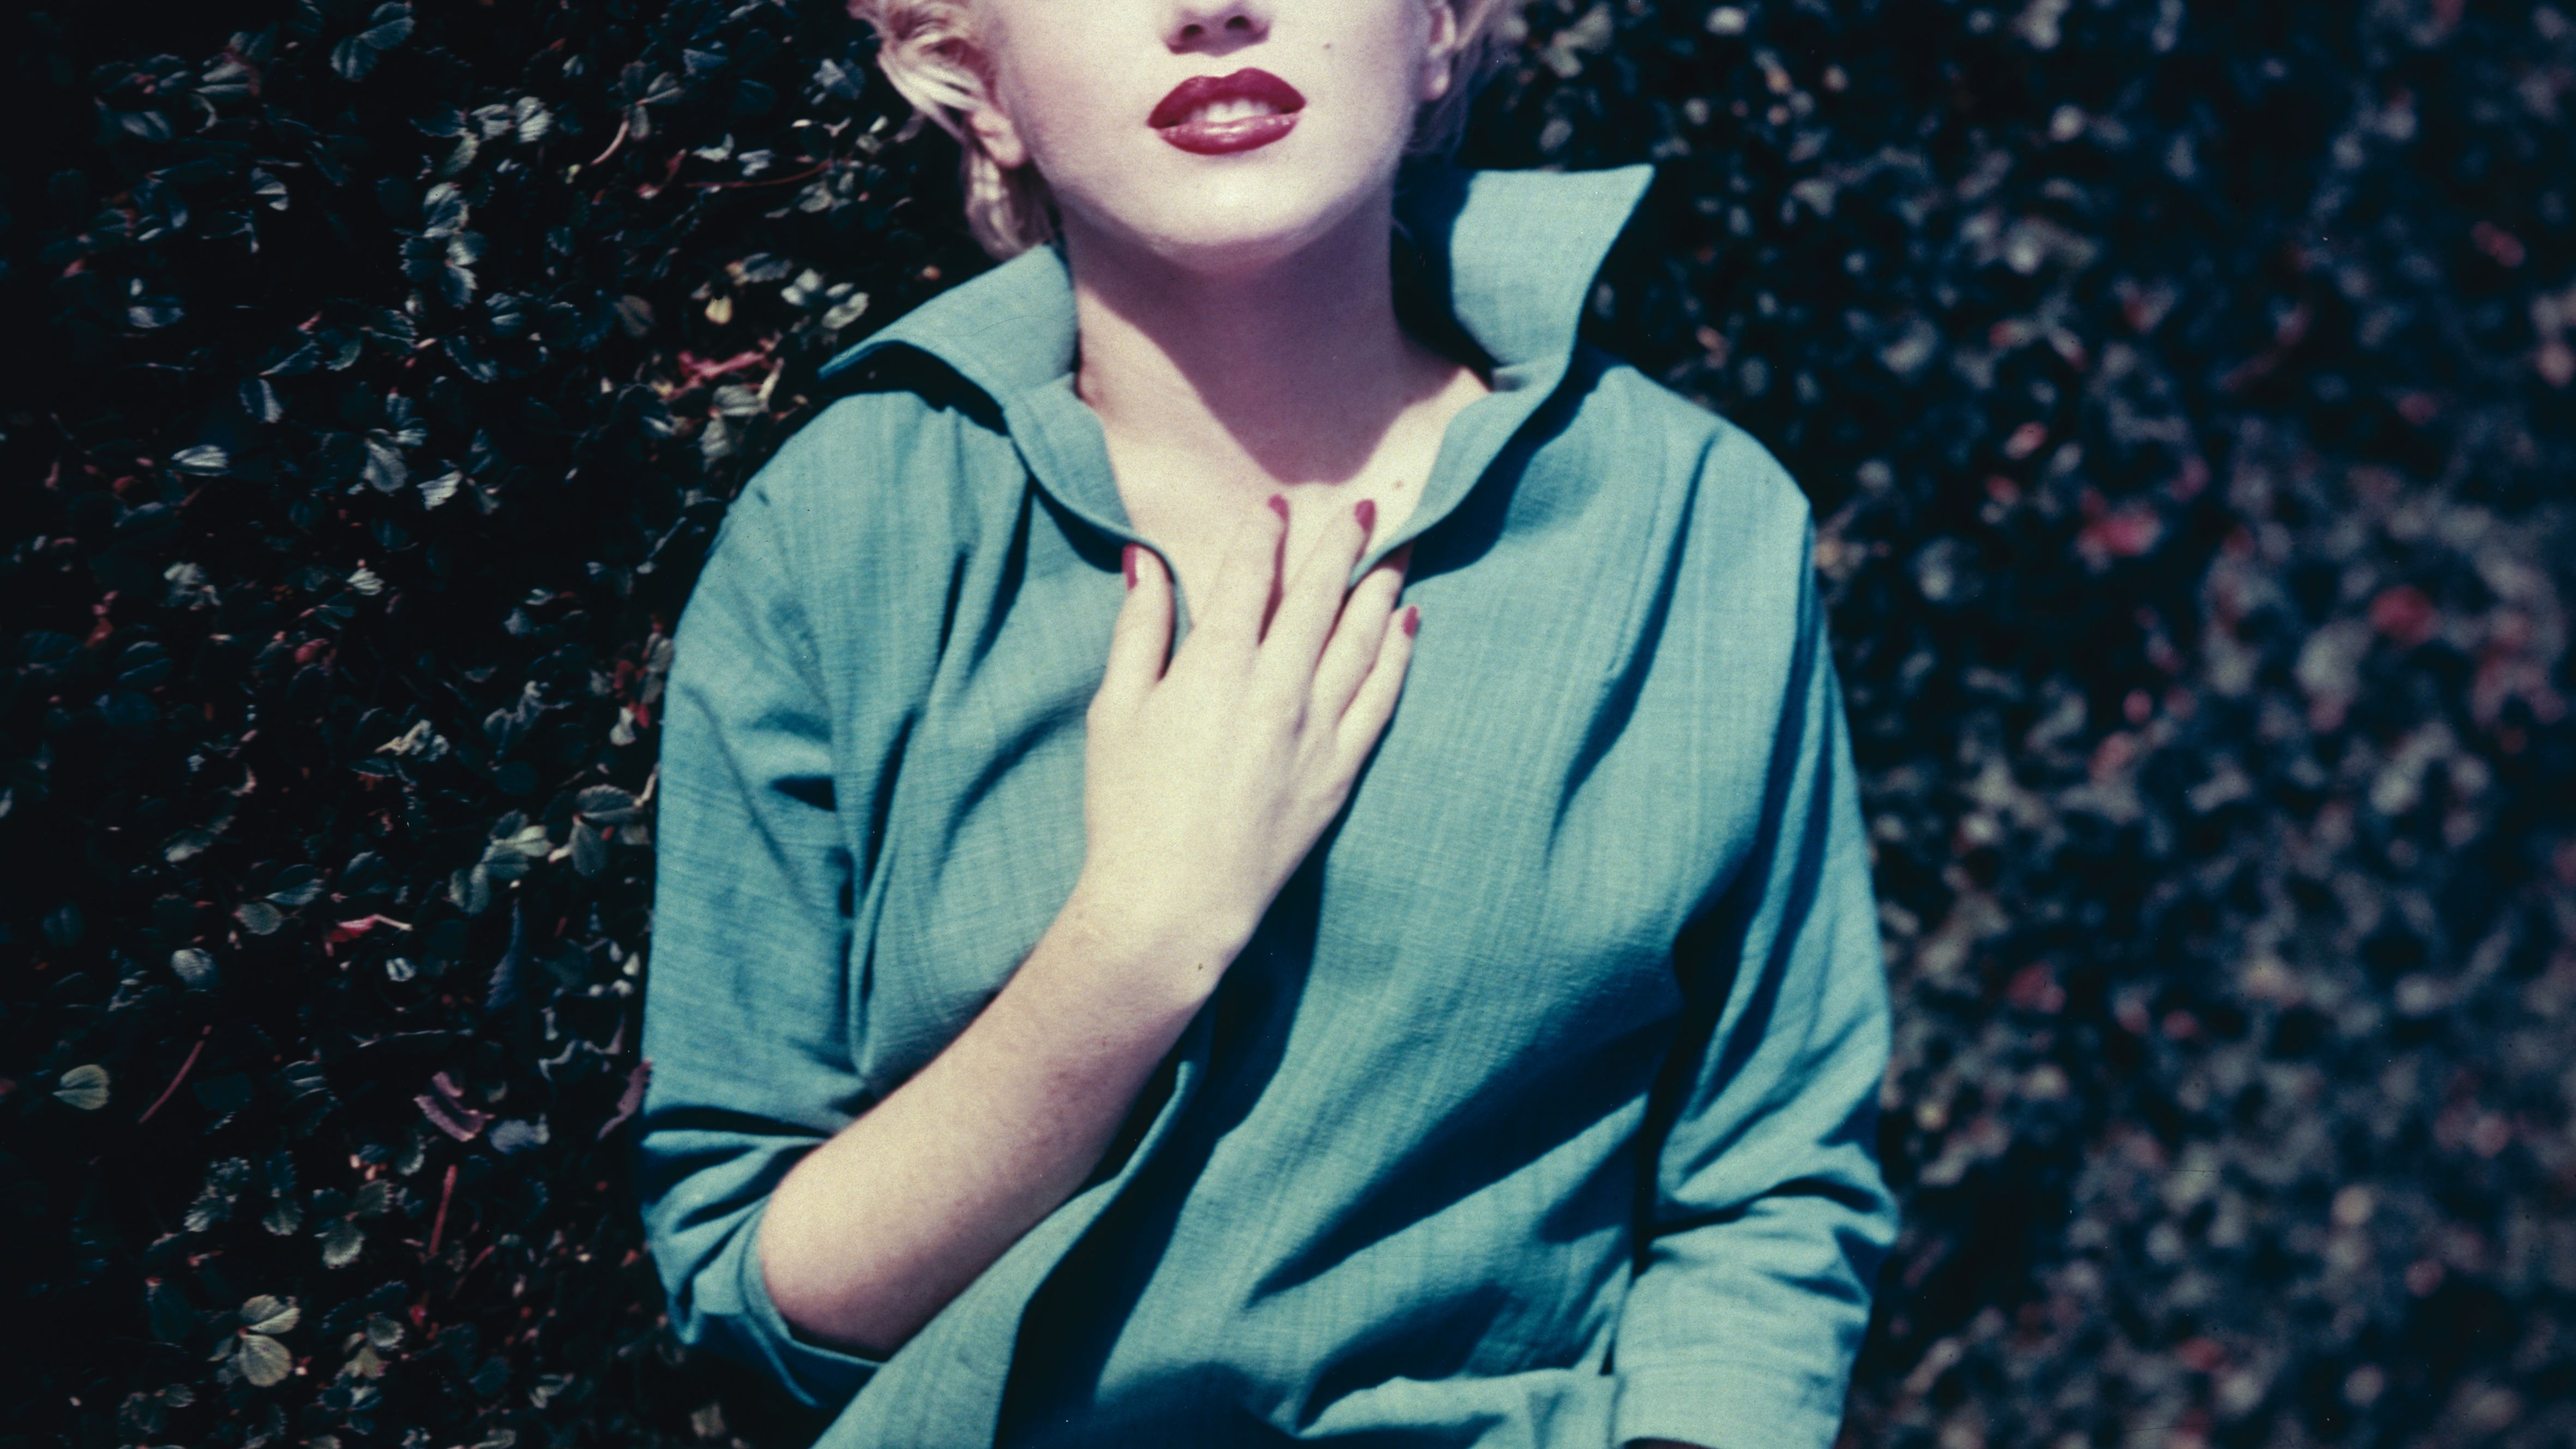 PUBLICITY PHOTO 1926-1962 Sex Symbol Gorgeous Actress Icon Marilyn Monroe